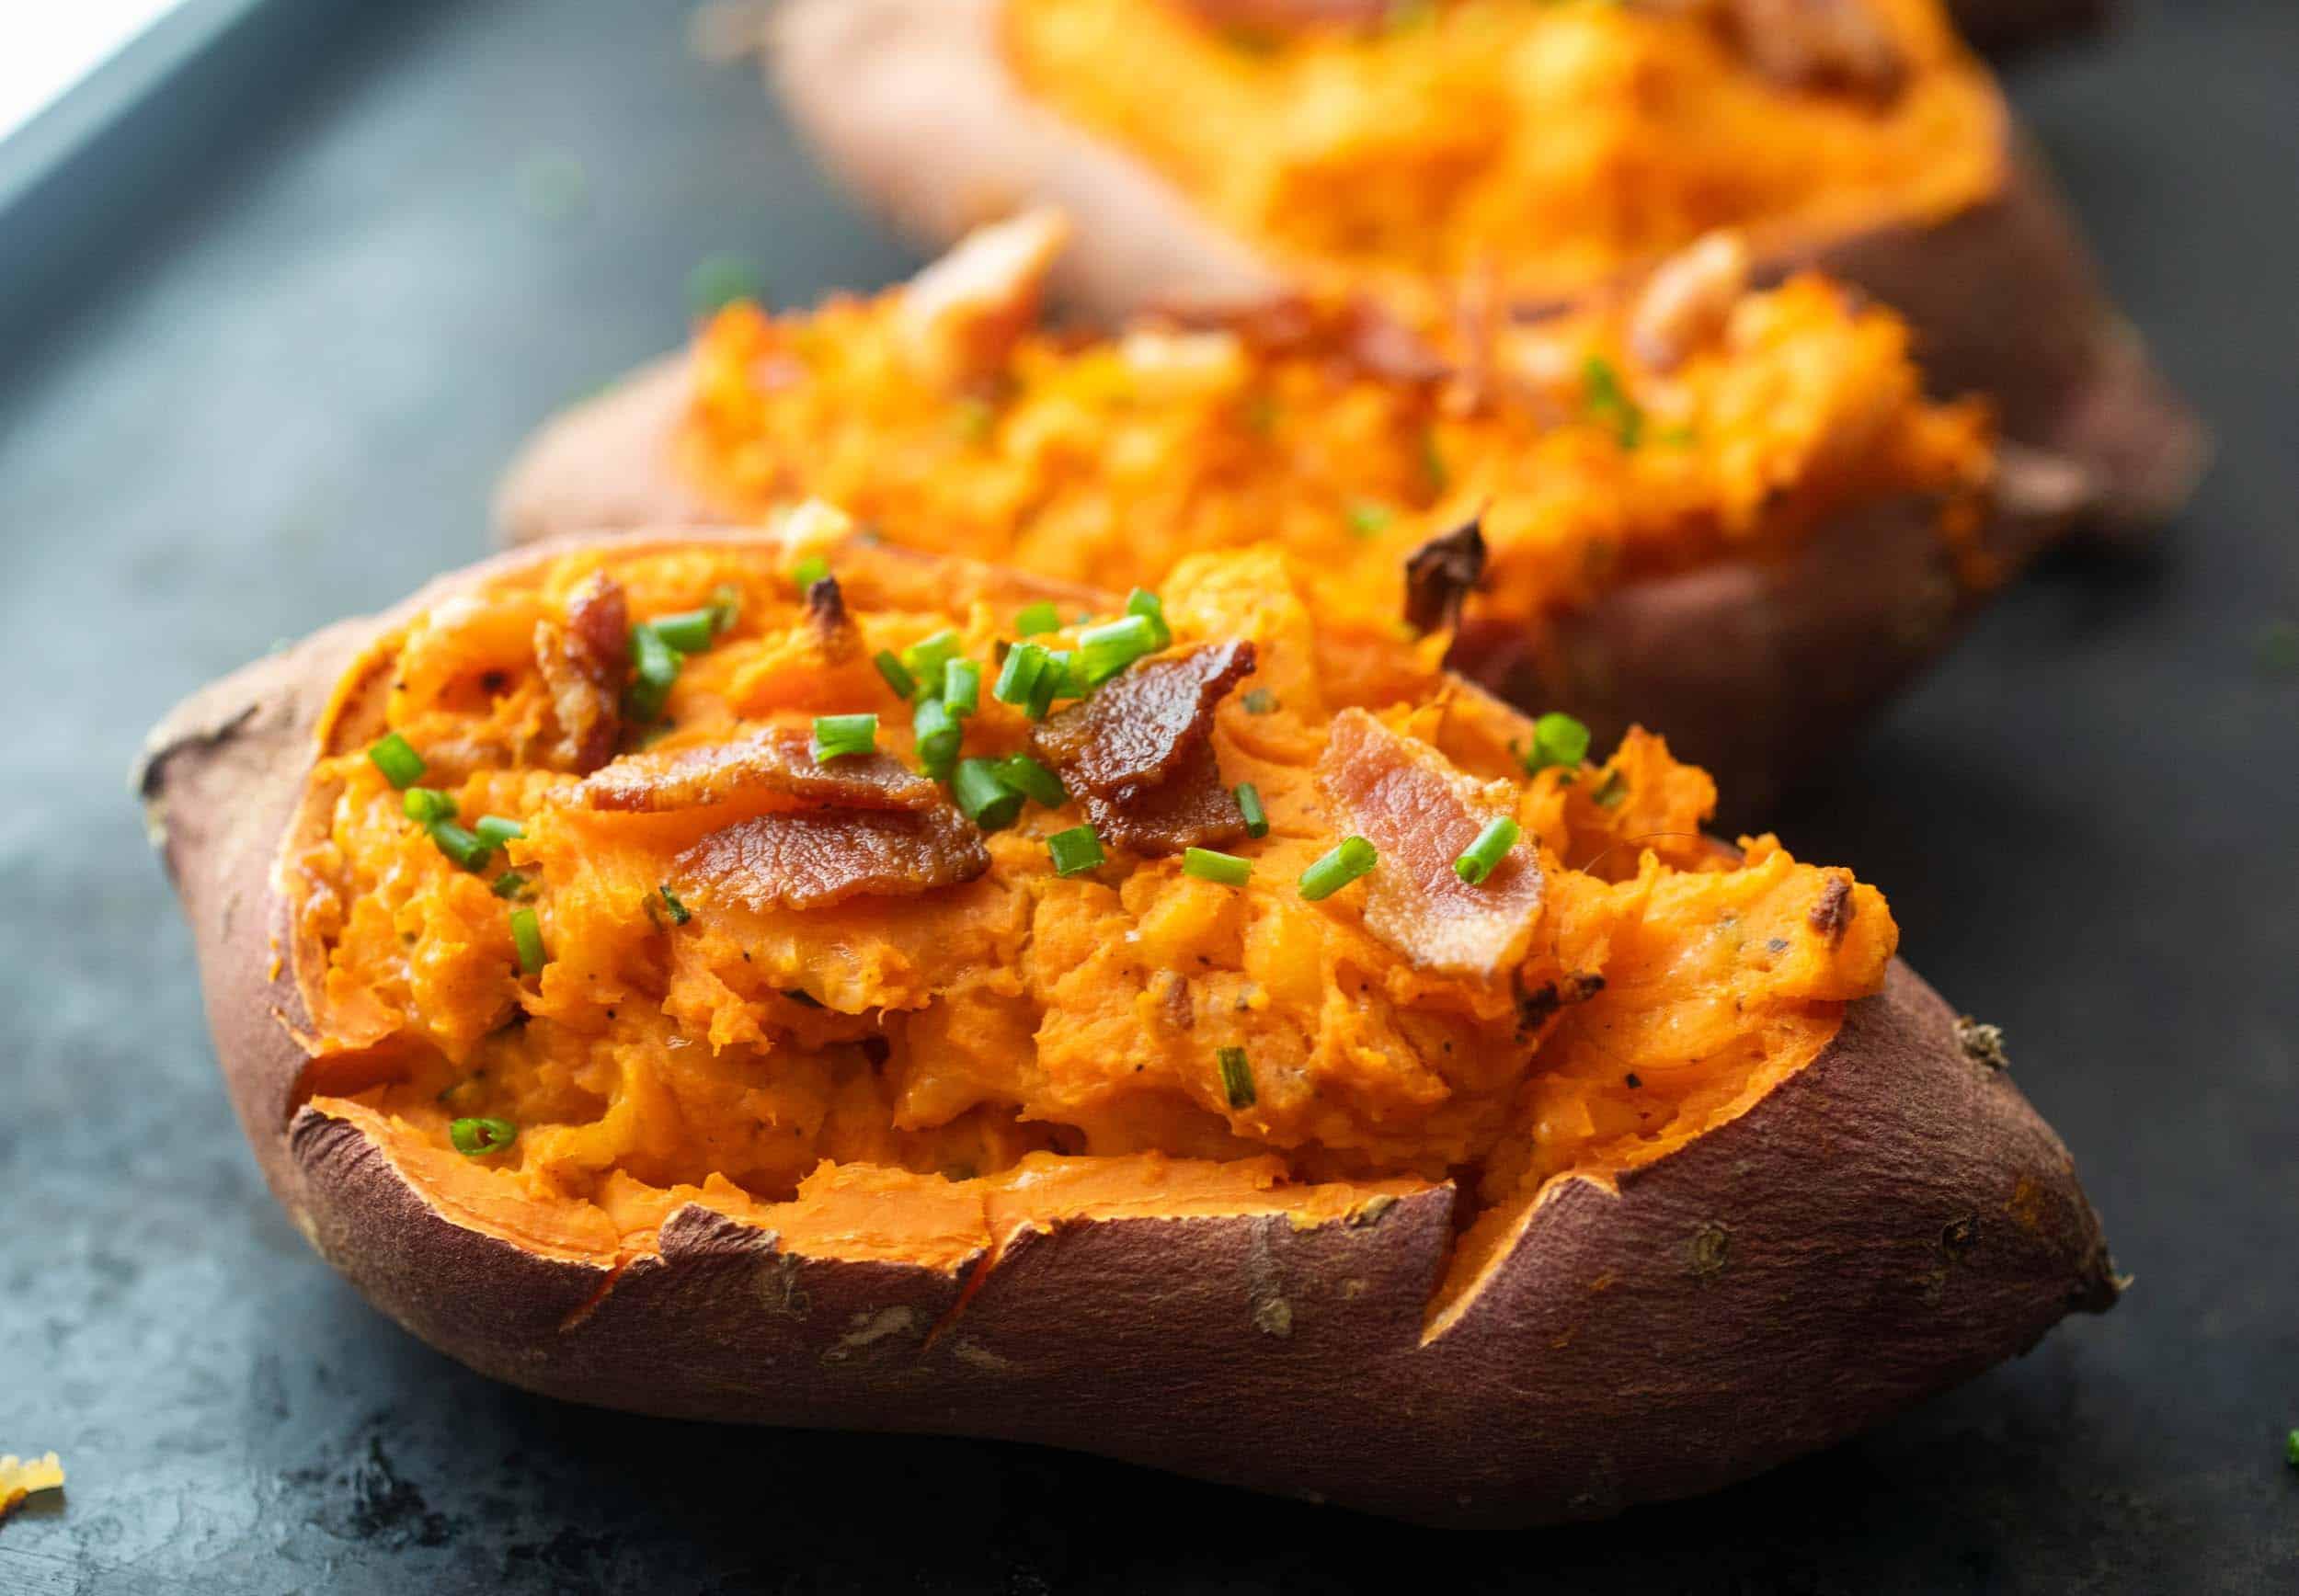 sweet potatoes, yams